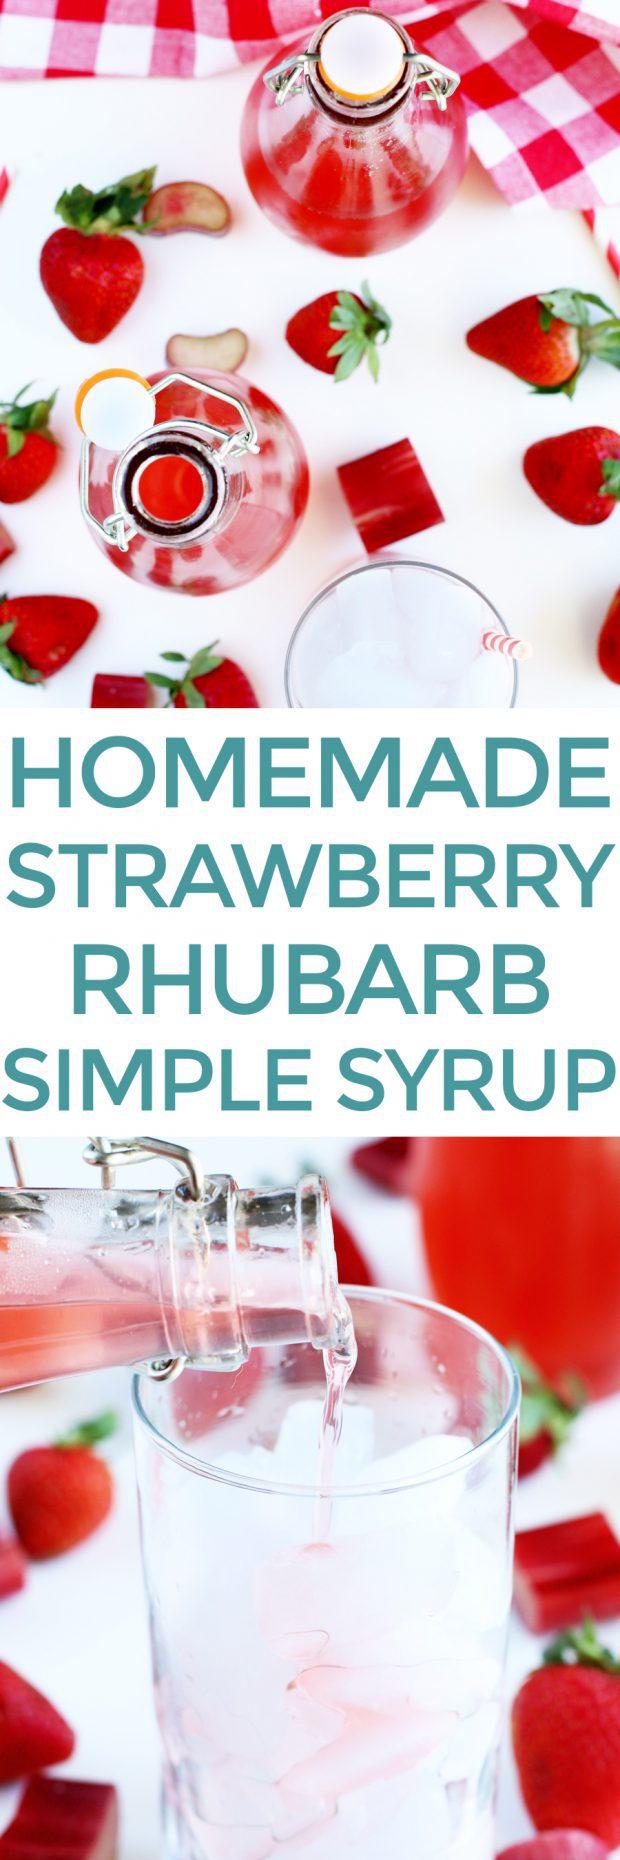 Homemade Strawberry Rhubarb Simple Syrup